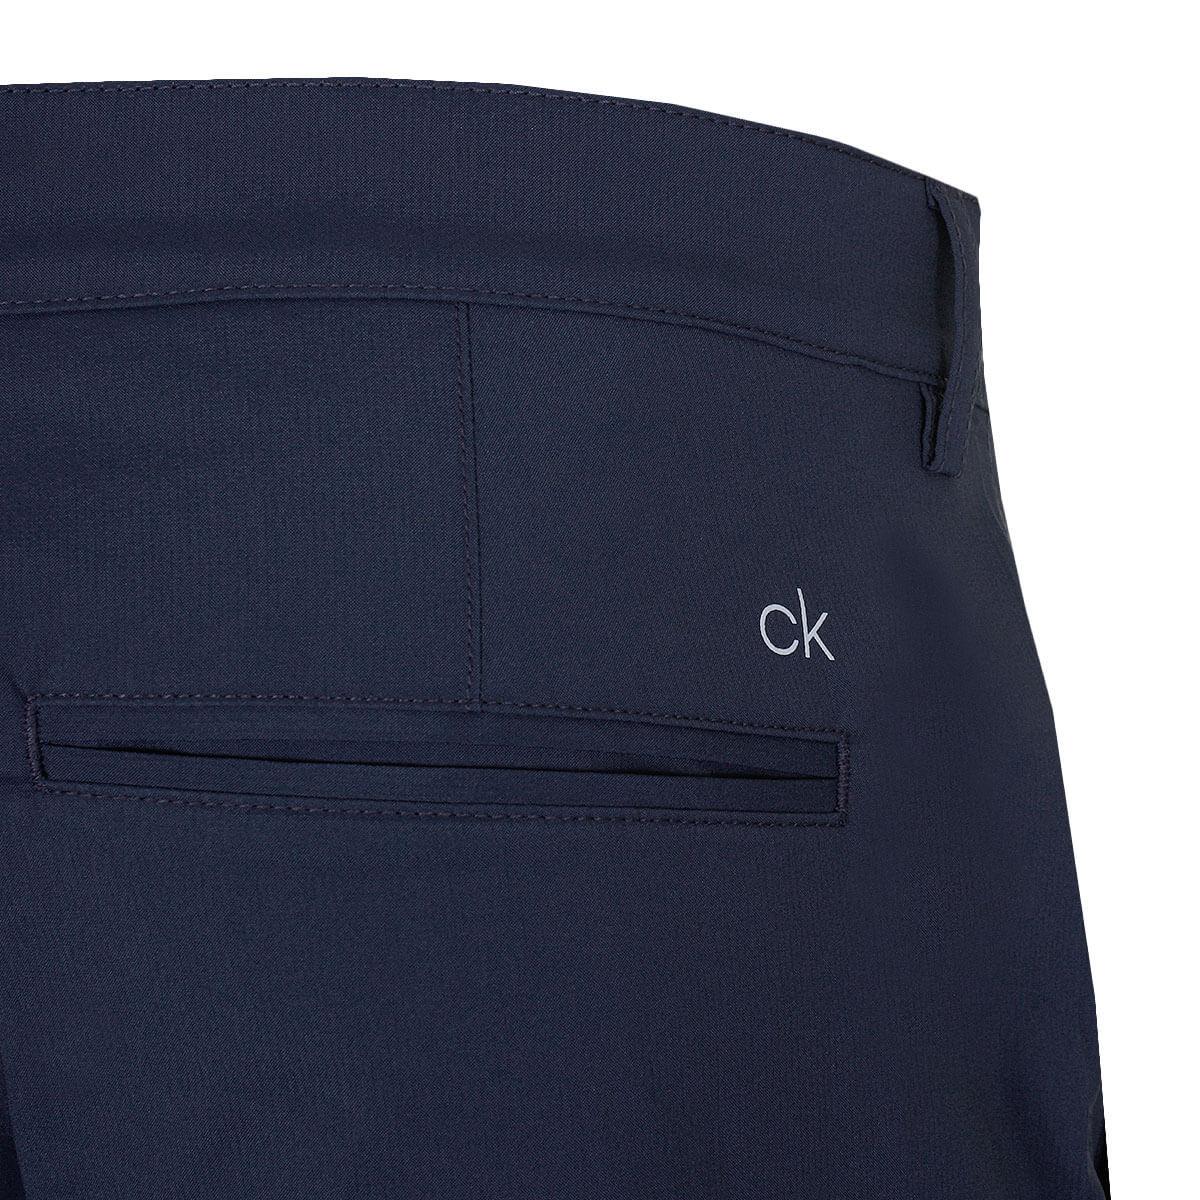 thumbnail 13 - Calvin Klein Mens 2021 Slim Fit Micro Tech Lightweight Golf Shorts 34% OFF RRP